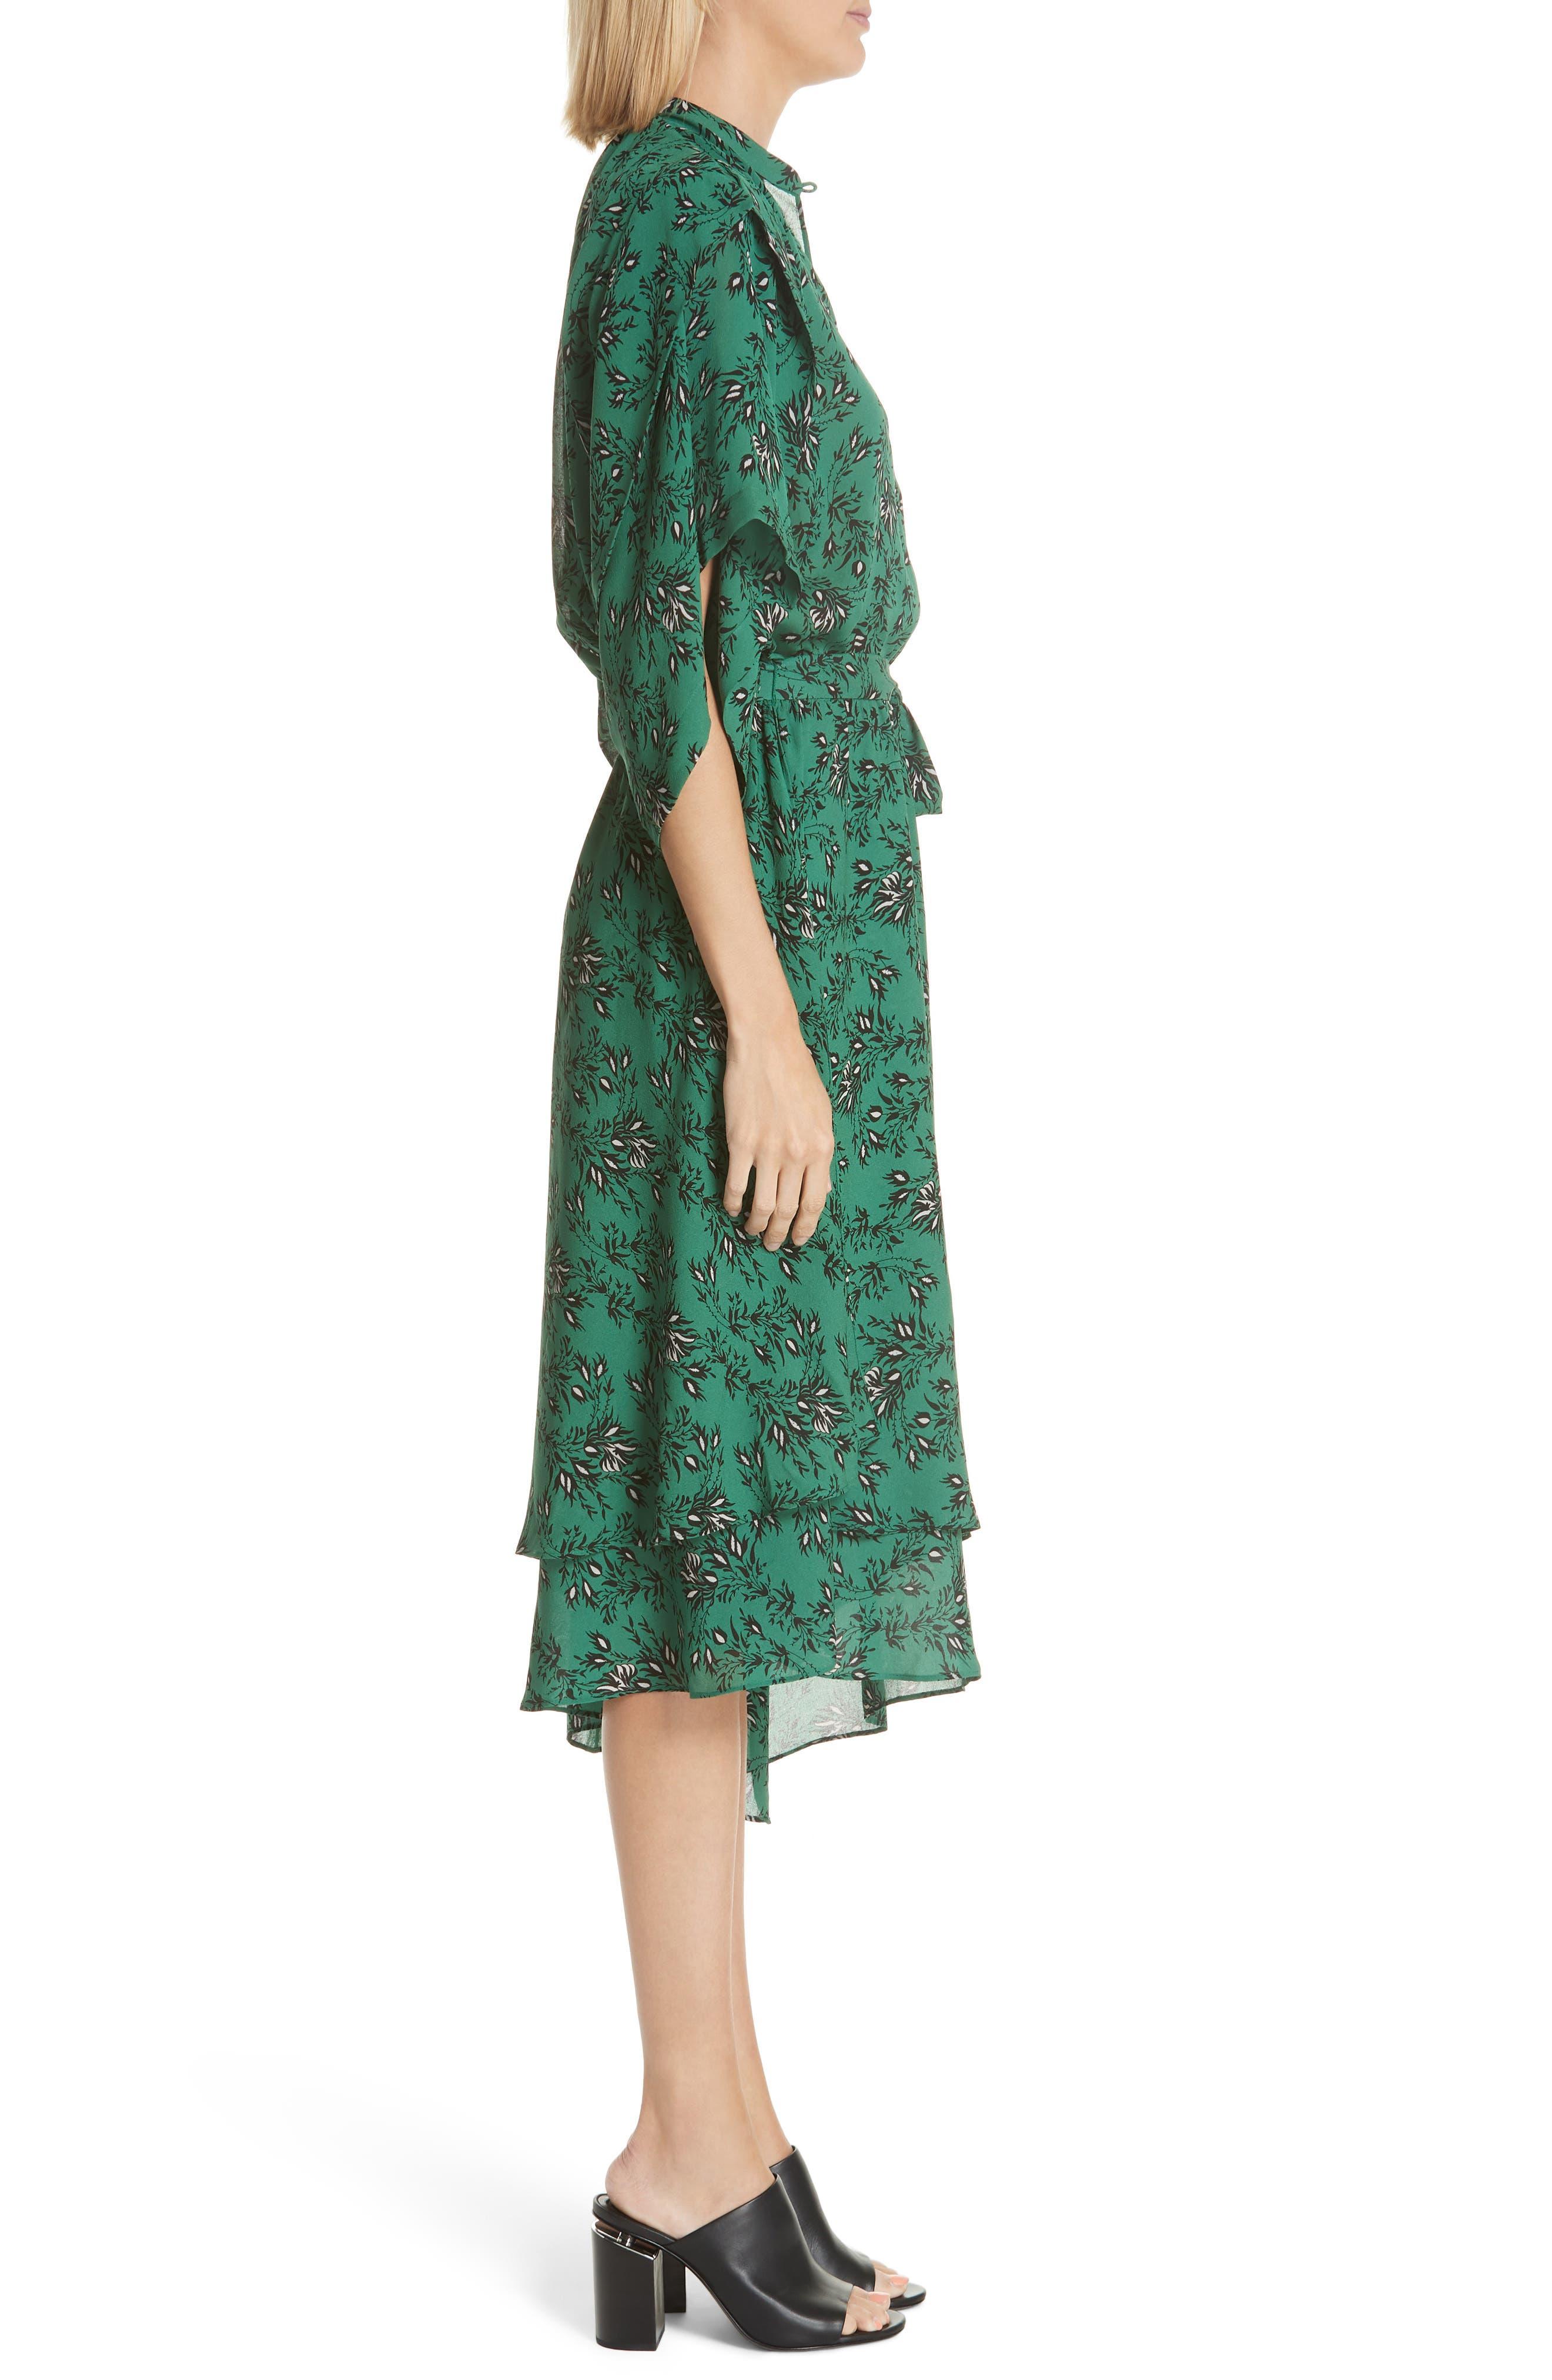 Japanese Floral Midi Dress,                             Alternate thumbnail 3, color,                             EMERALD ORCHID